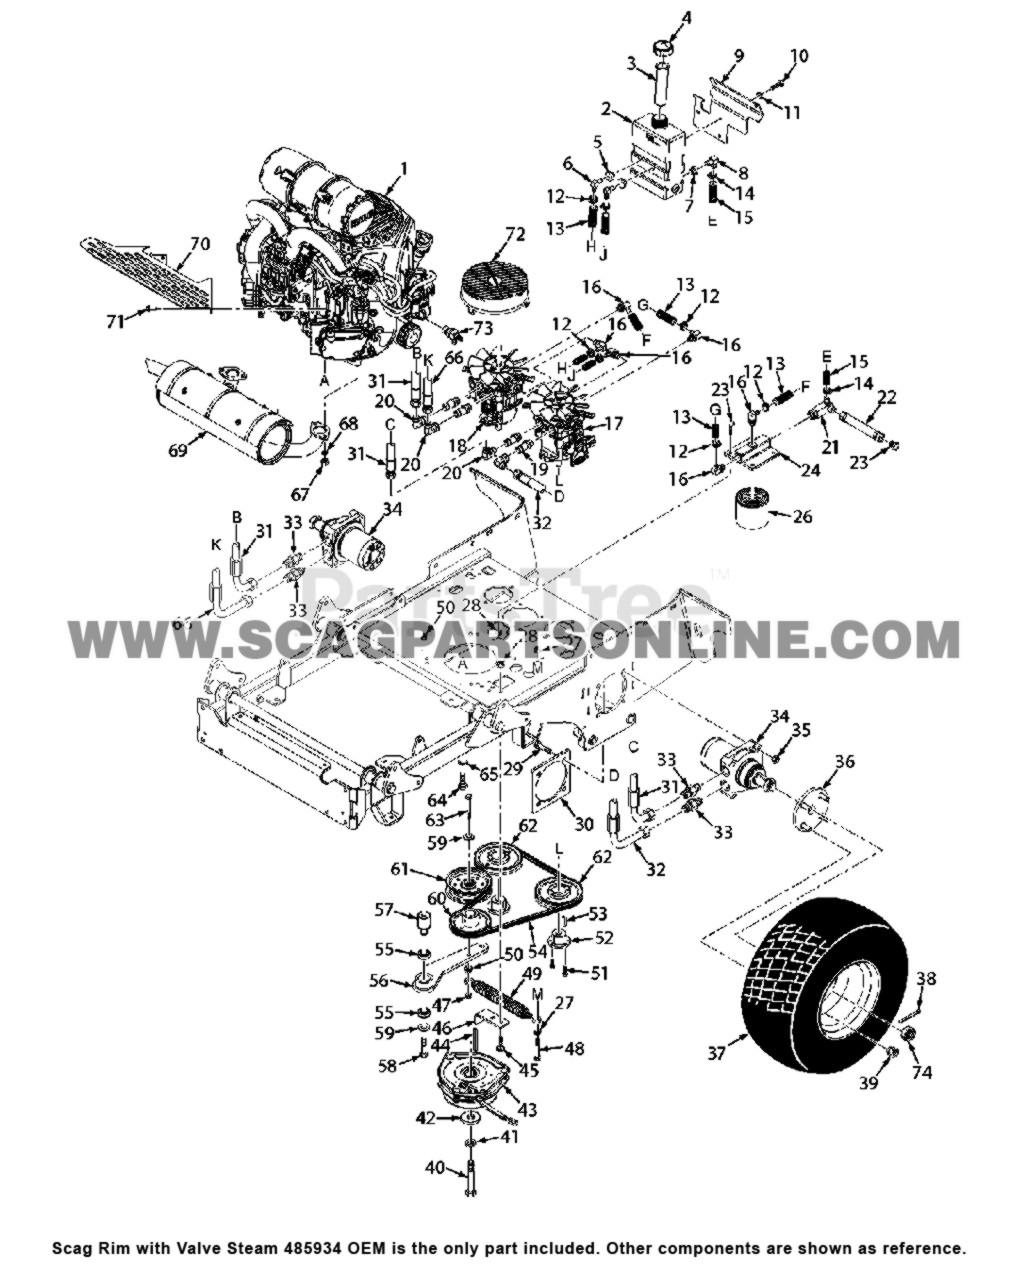 Parts lookup Scag Rim with Valve Steam 485934 OEM diagram